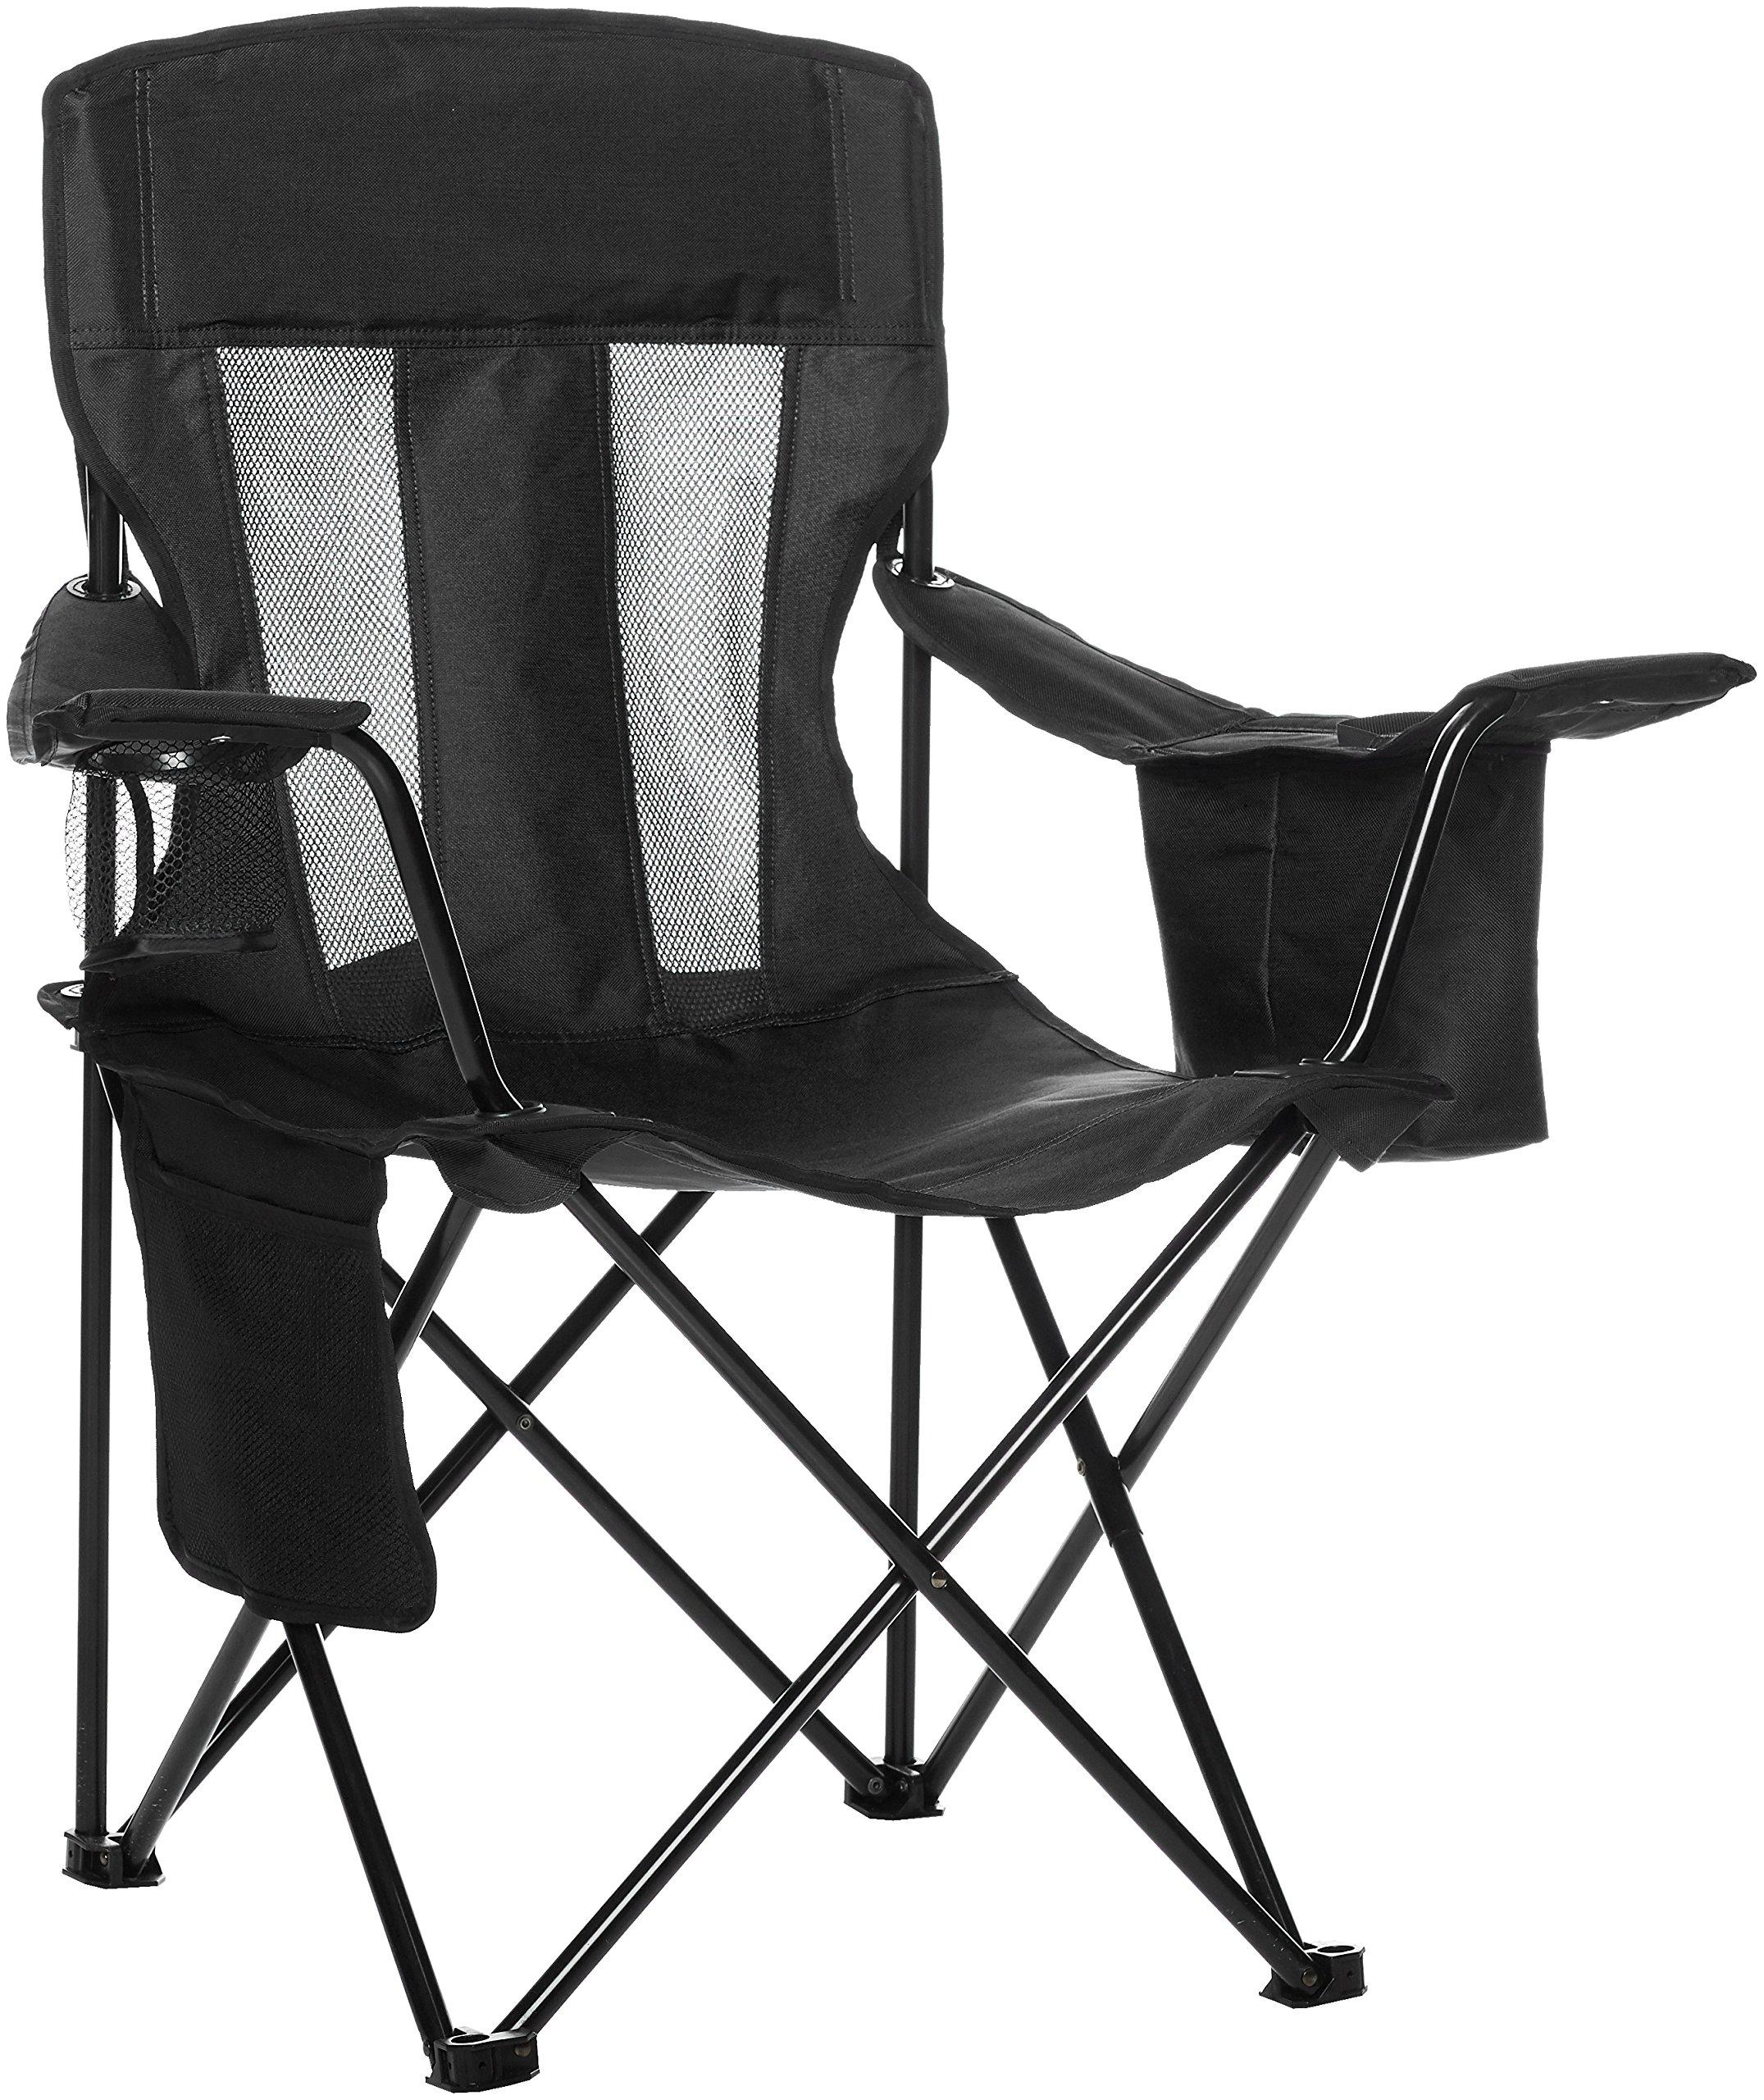 ویکالا · خرید  اصل اورجینال · خرید از آمازون · AmazonBasics Mesh Folding Outdoor Camping Chair With Bag - 34 x 20 x 36 Inches, Black wekala · ویکالا